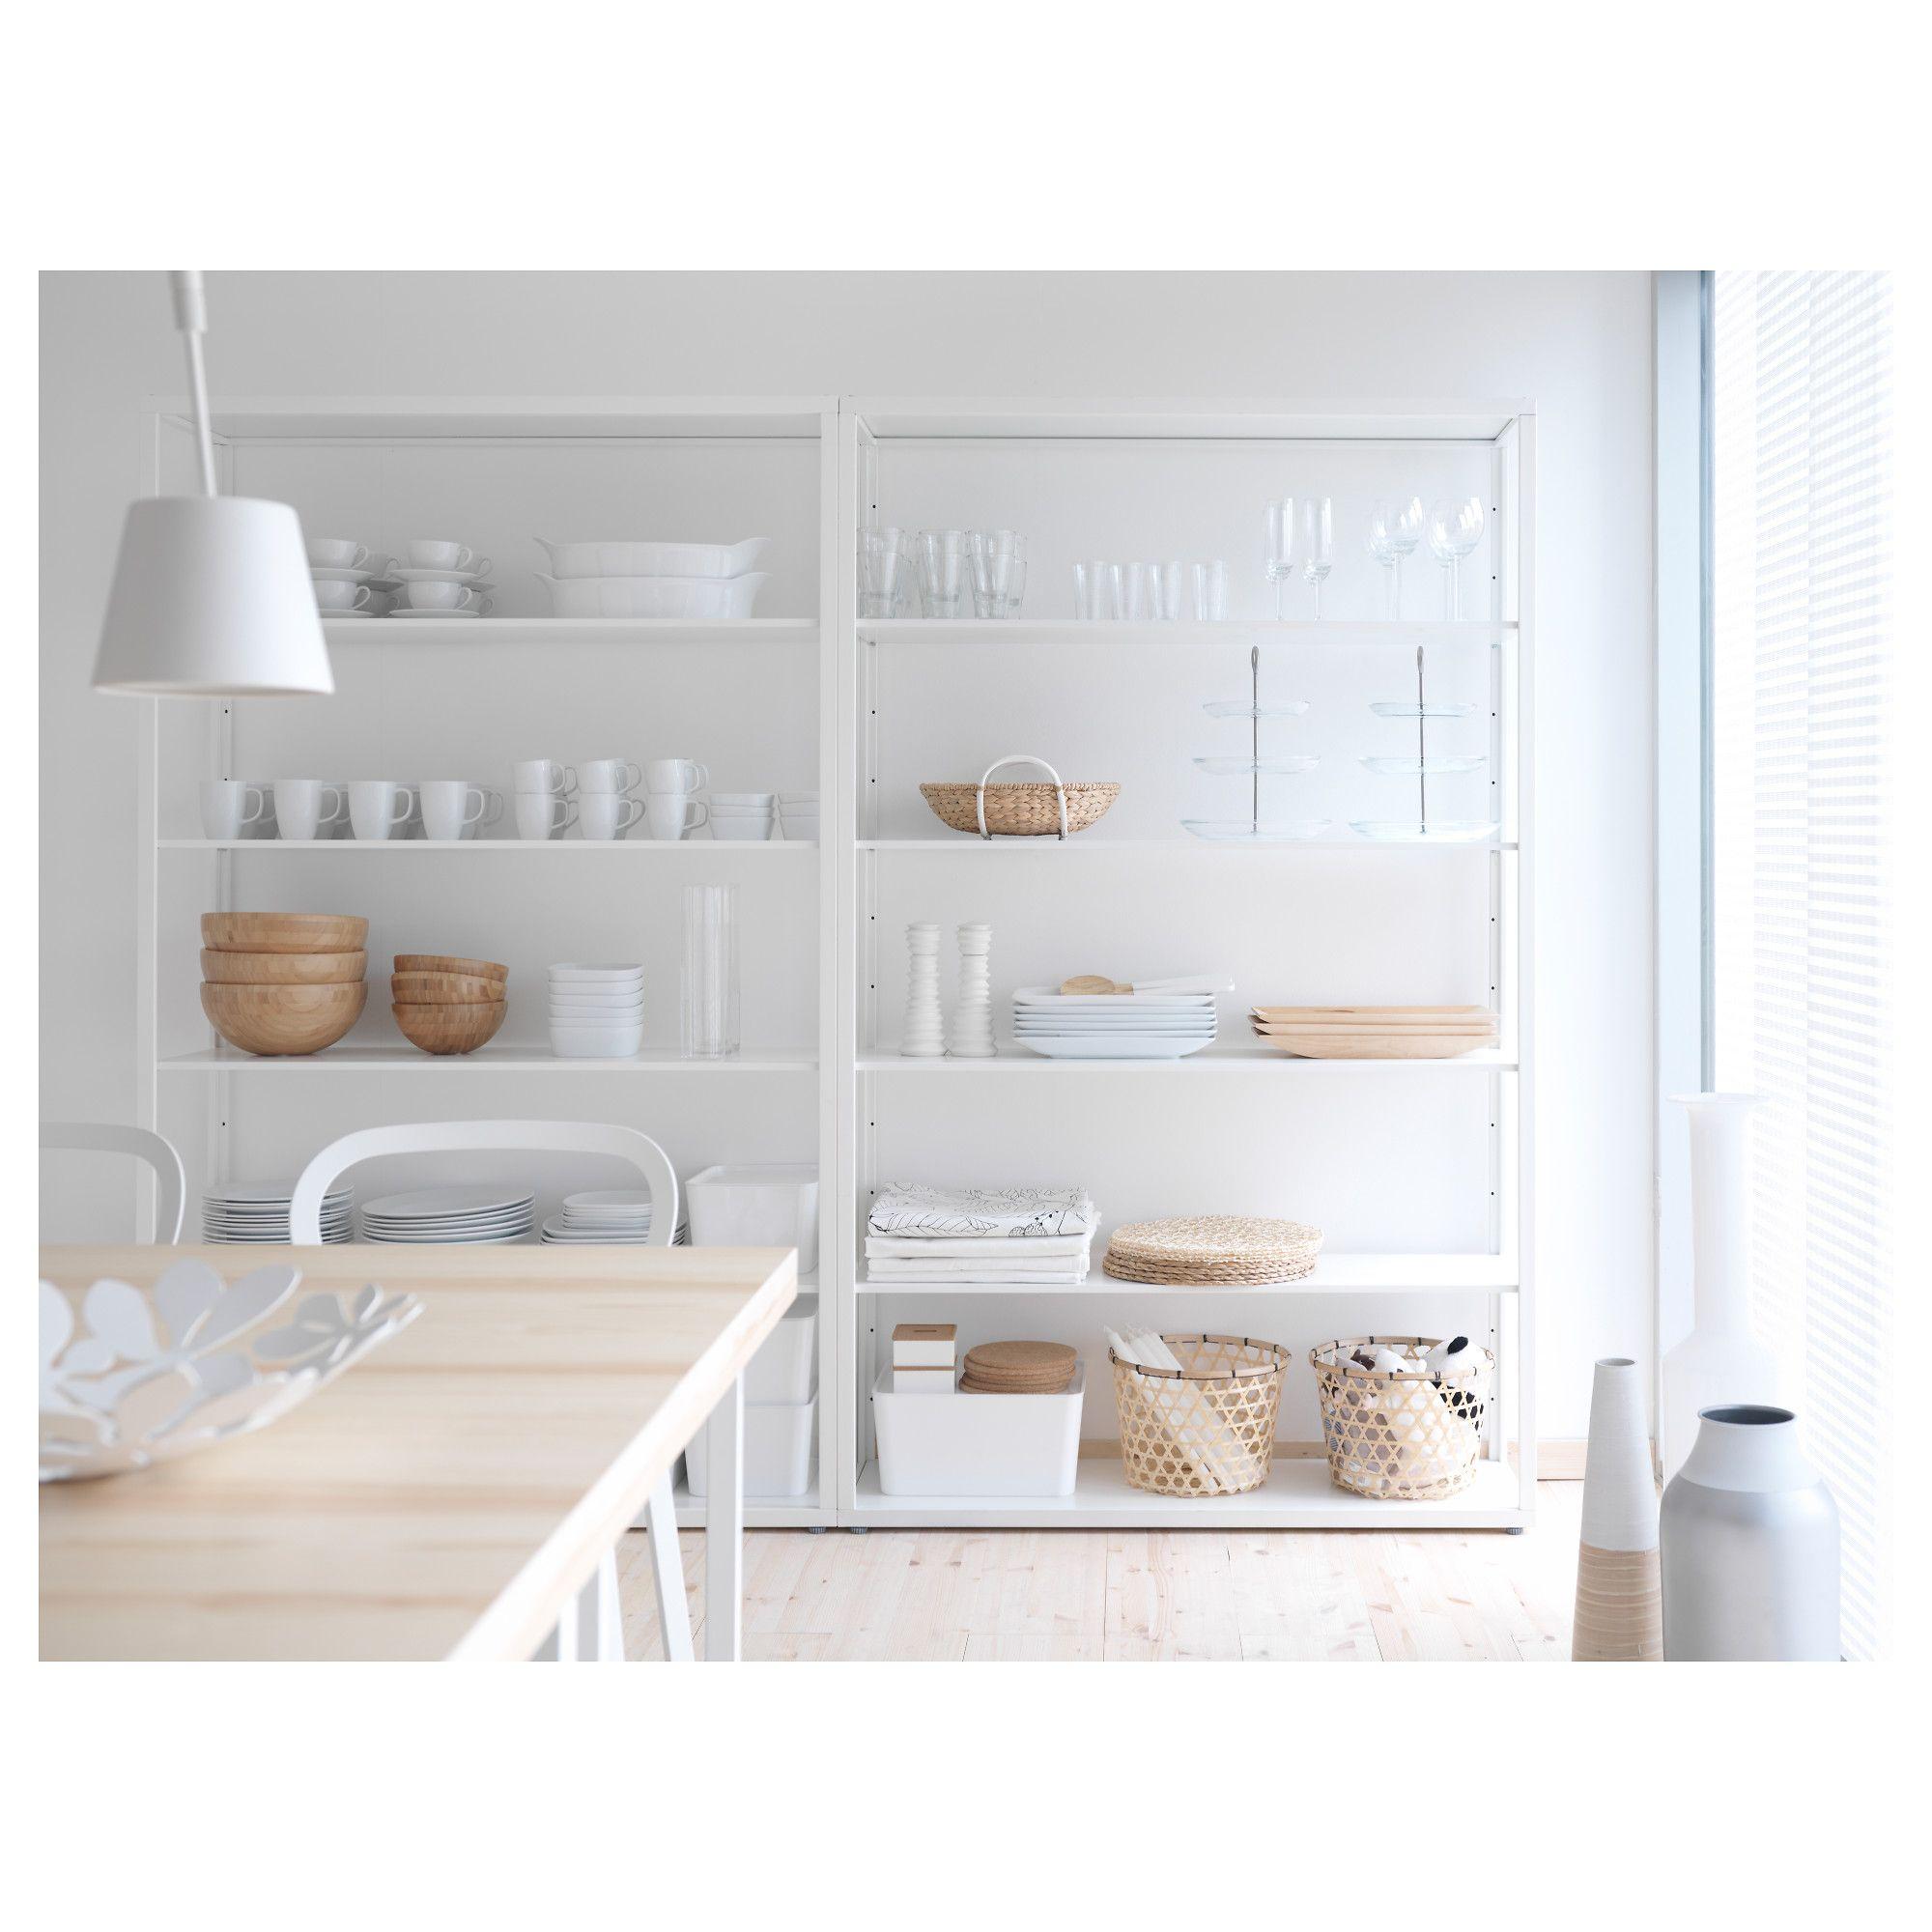 FJÄLKINGE Shelving unit with drawers White 118x193 cm | Drawers ...